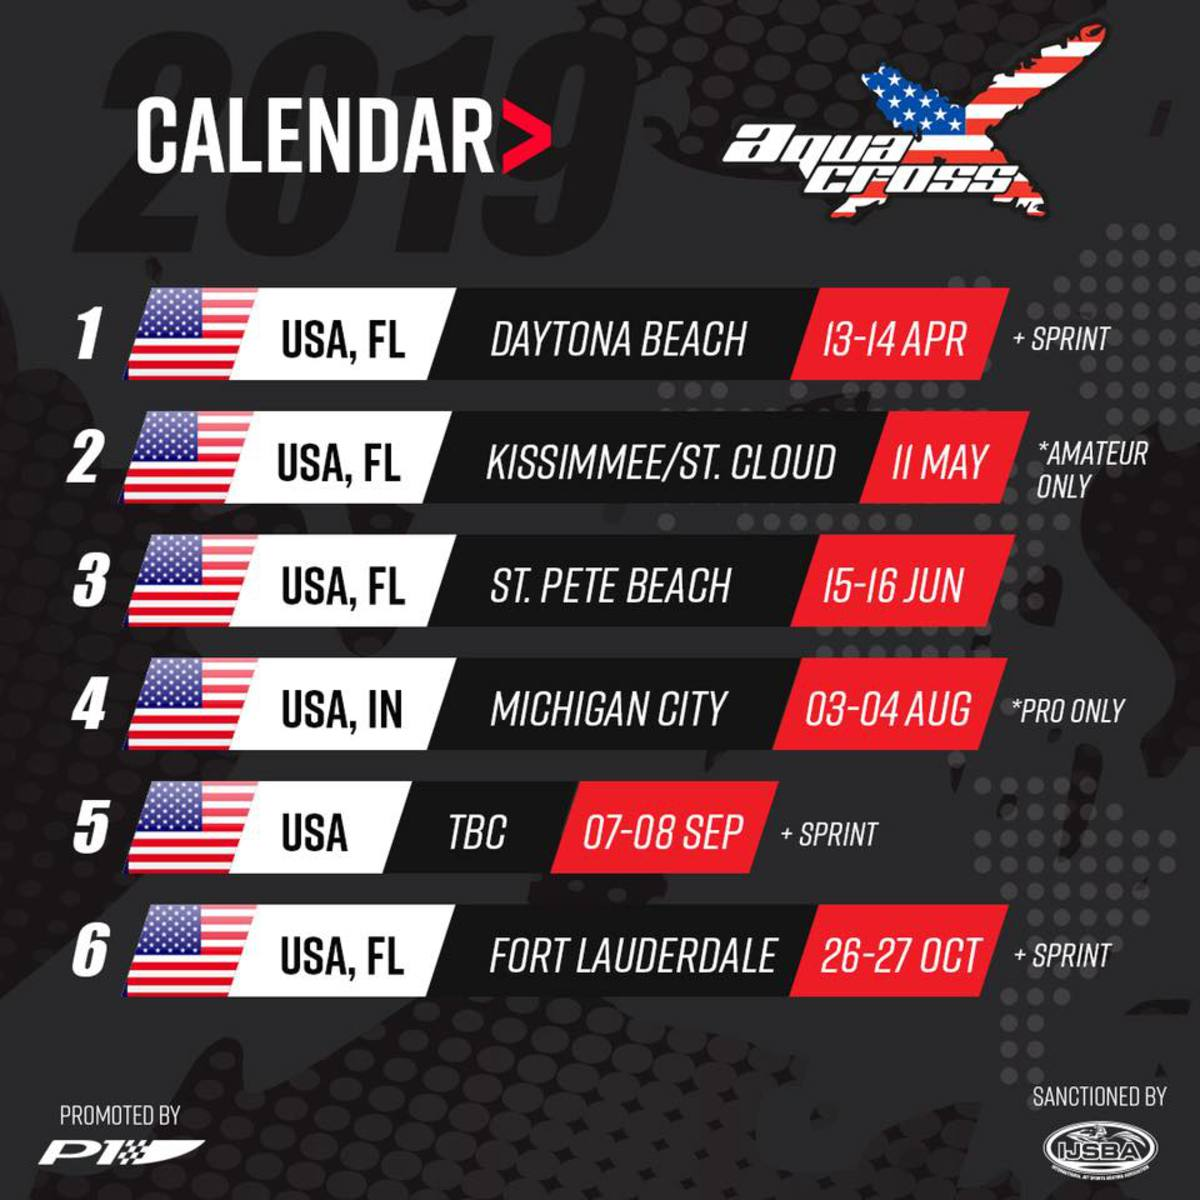 Races Calendar 2019 P1 Announces Biggest Ever Race Calendar for 2019   P1 AquaX